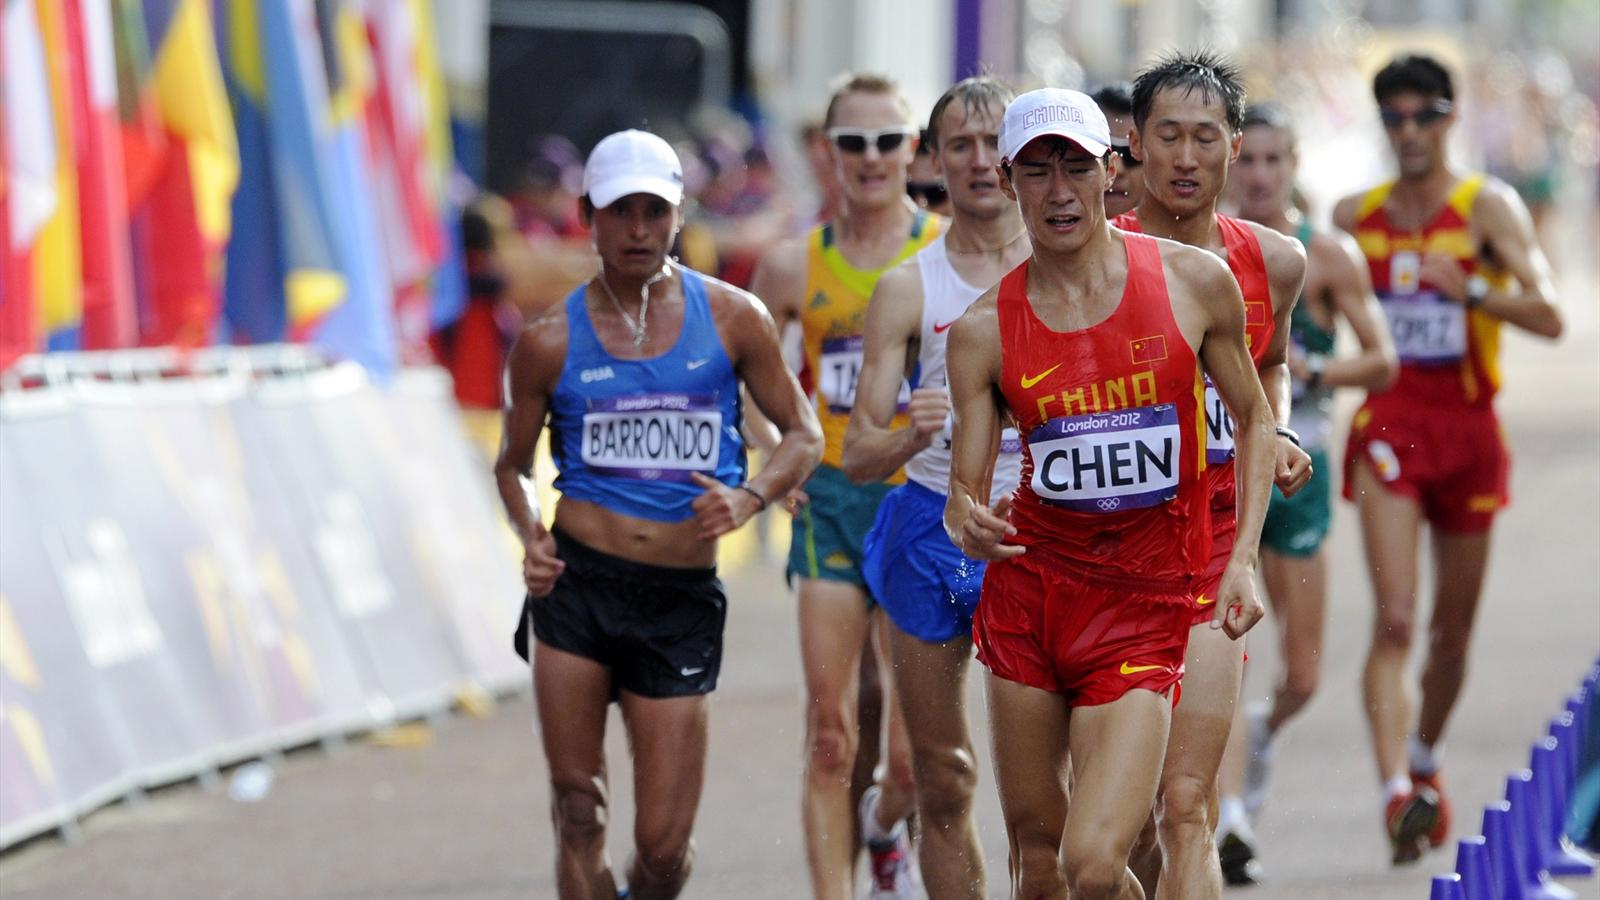 Chen wins 20km walk - Olympic Games 2012 - Athletics - Eurosport